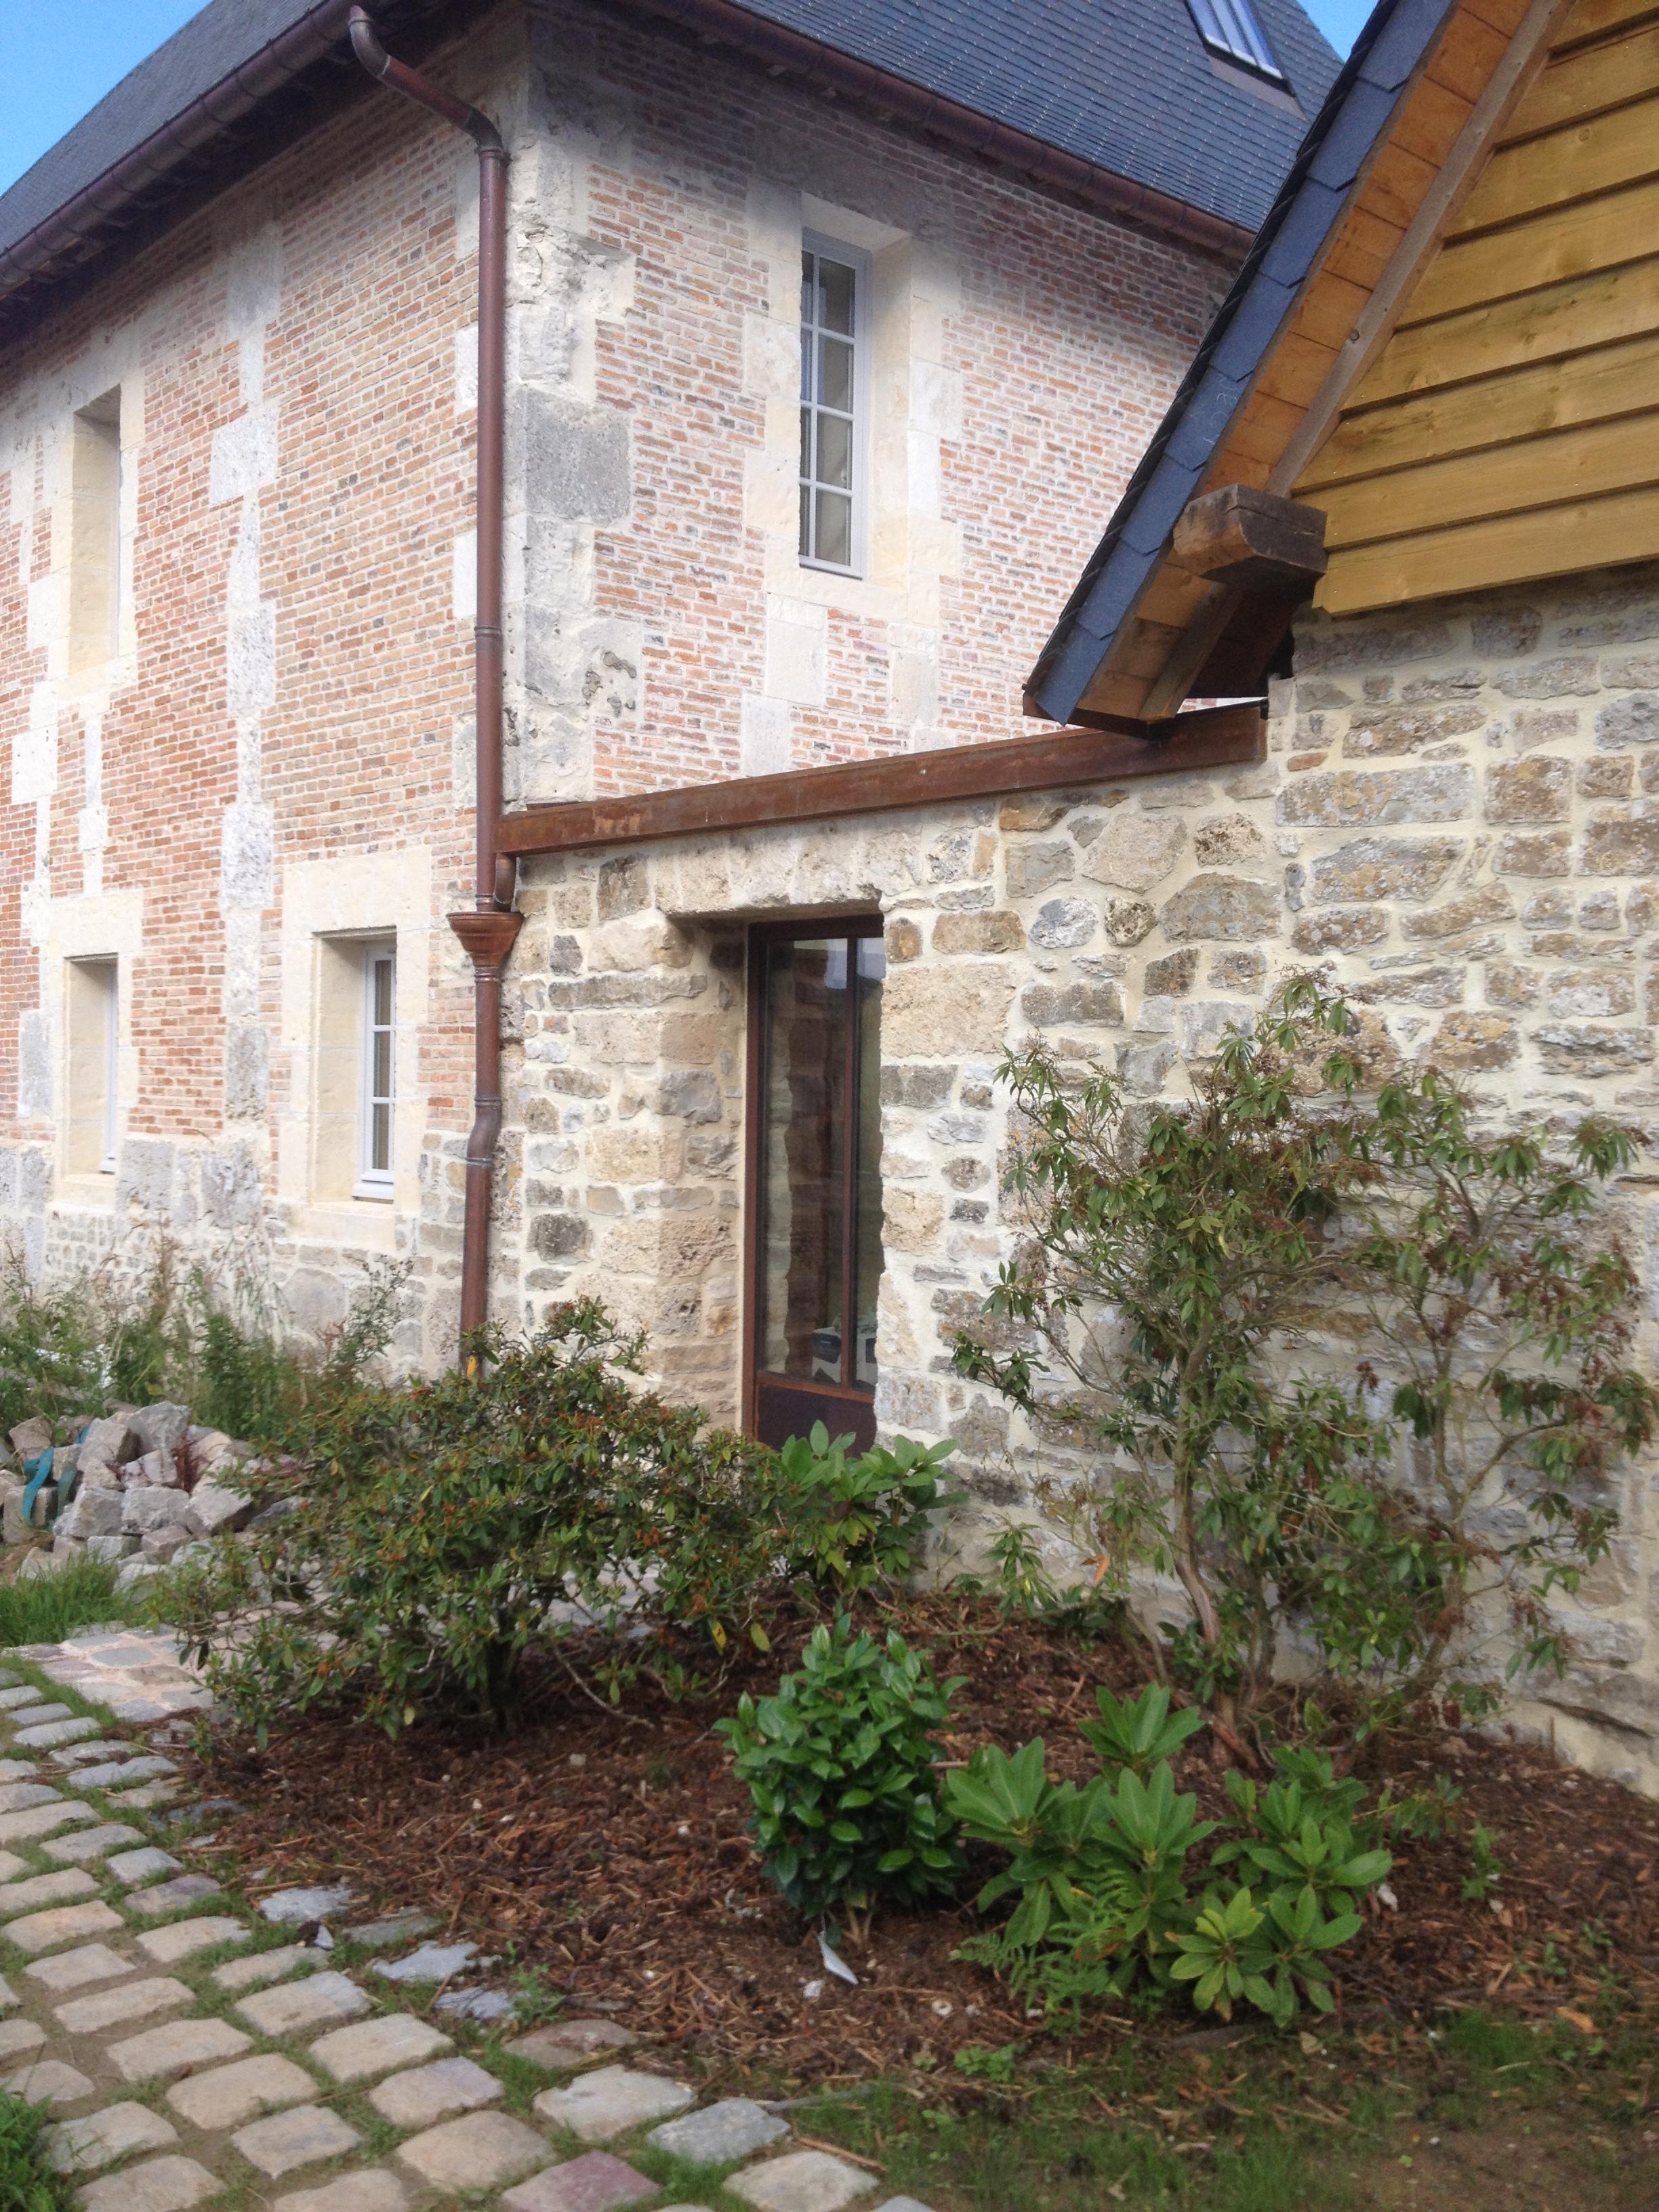 Eglise Mesnil sur Blangy avant (1).jpg